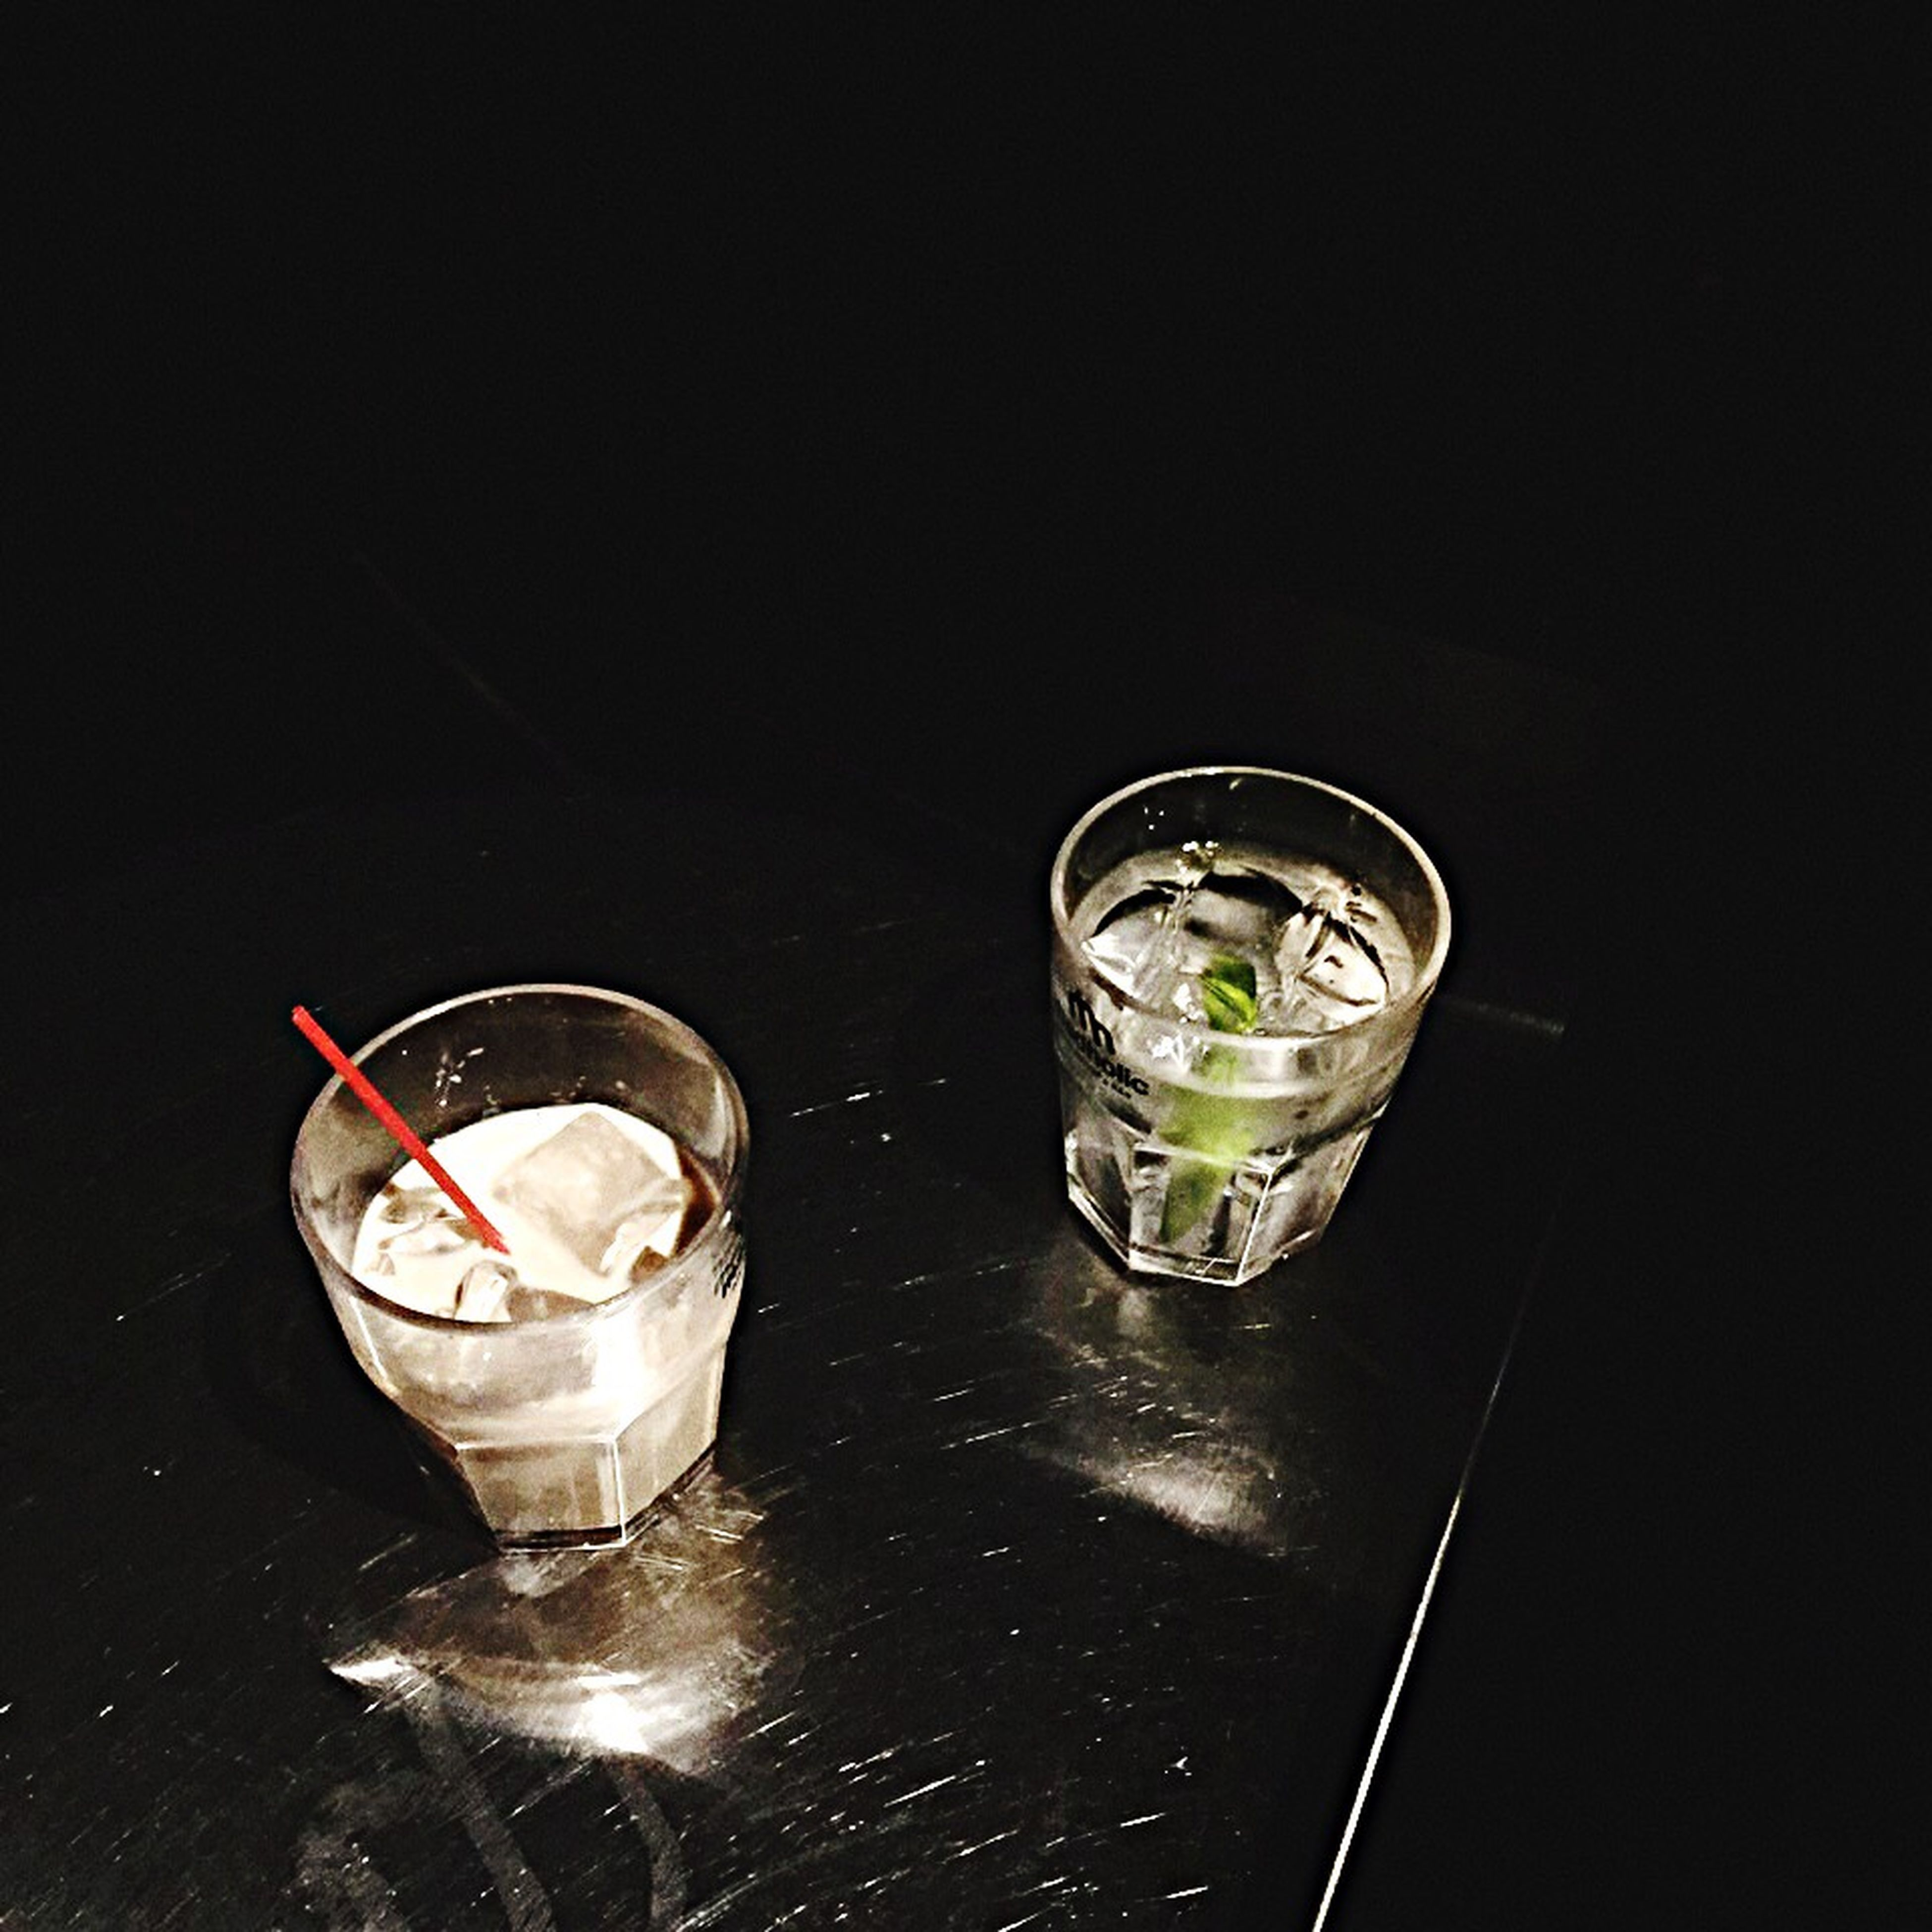 food and drink, freshness, no people, black background, modern, man made object, indulgence, darkroom